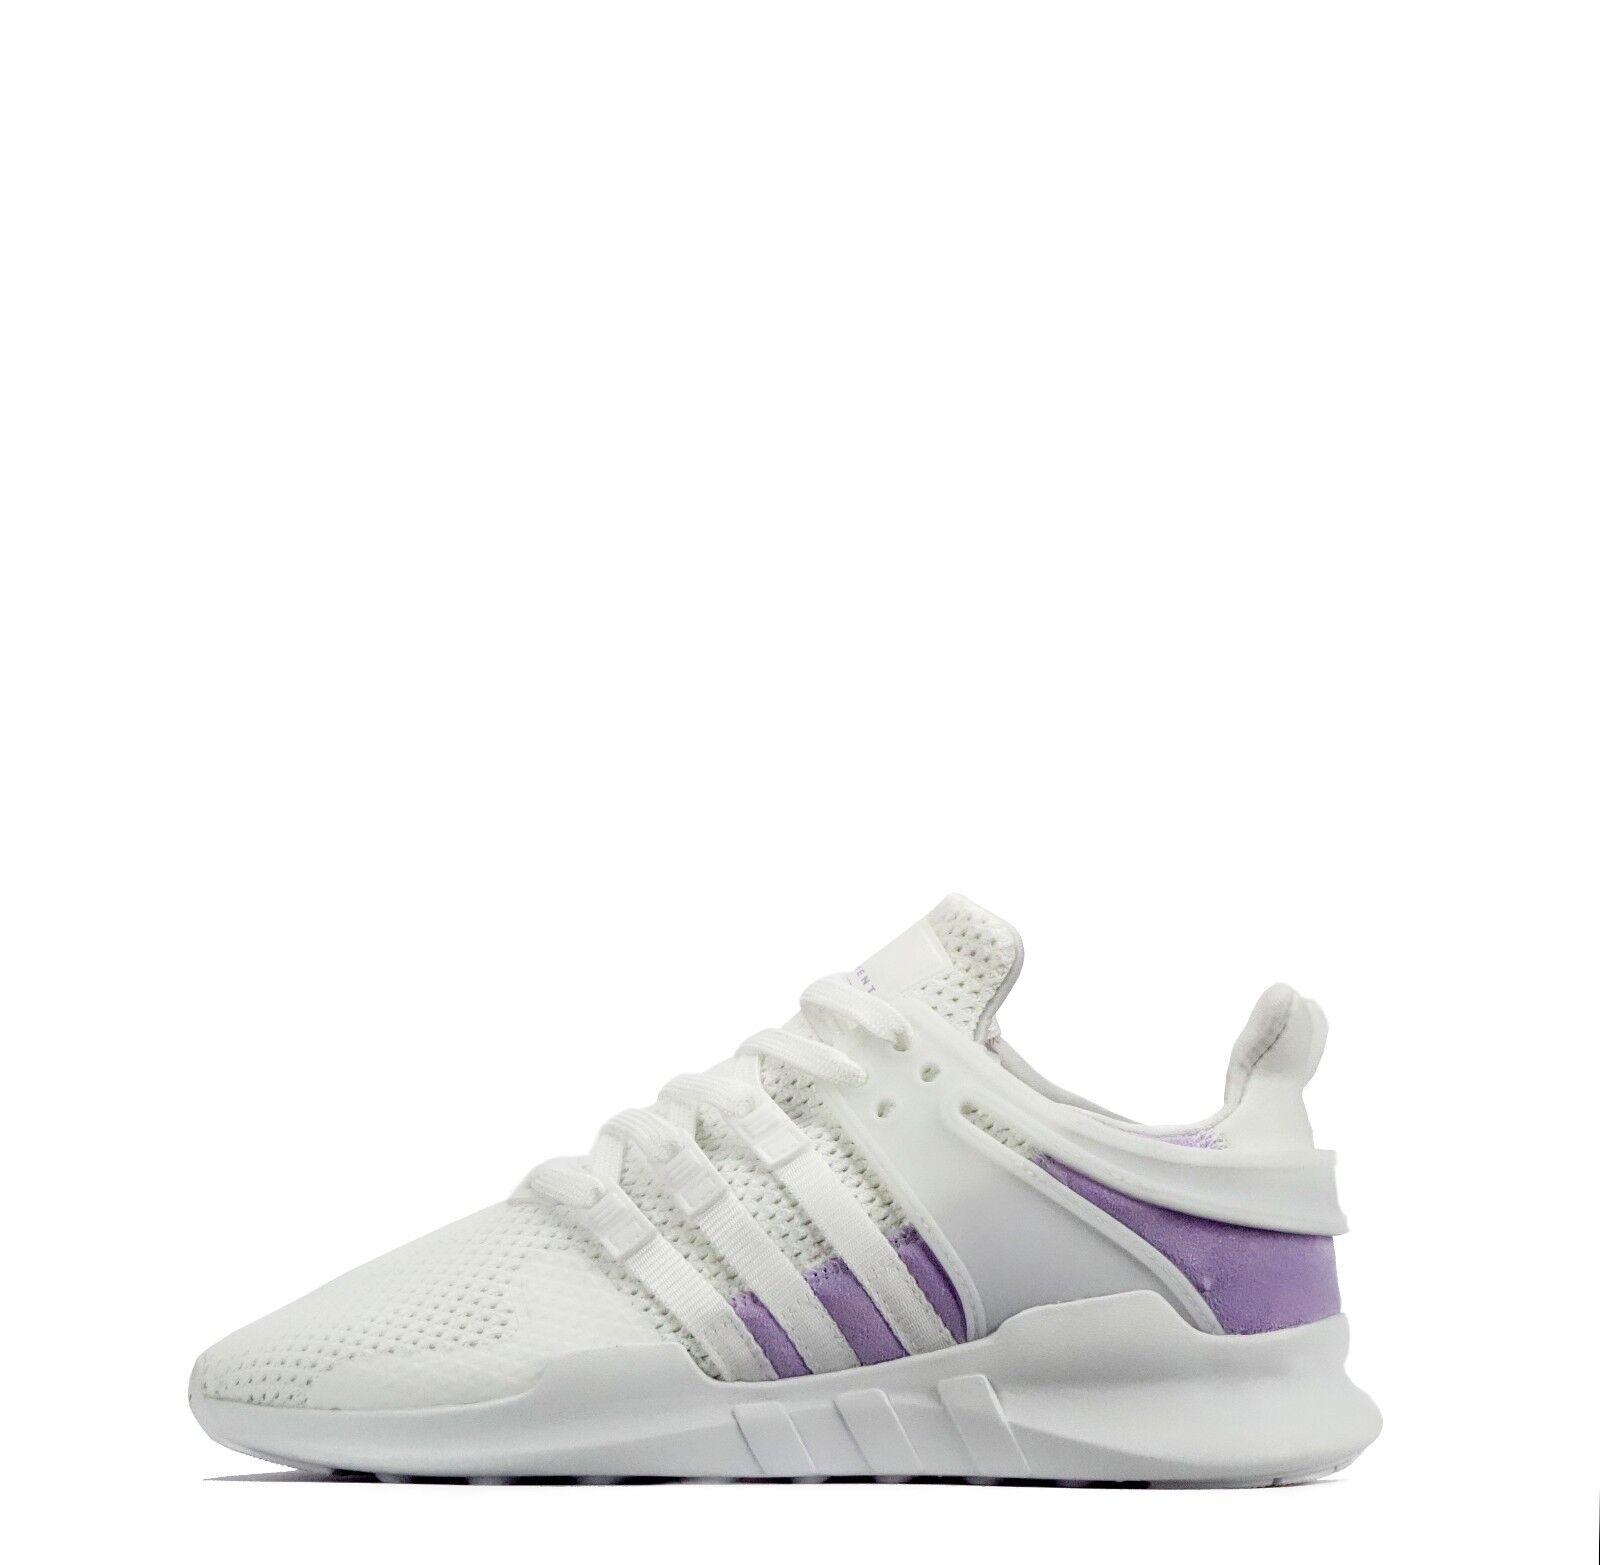 adidas adidas adidas Originals EQT Support ADV femmes Lightweight Casual Chaussures blanc/ Violet 430430